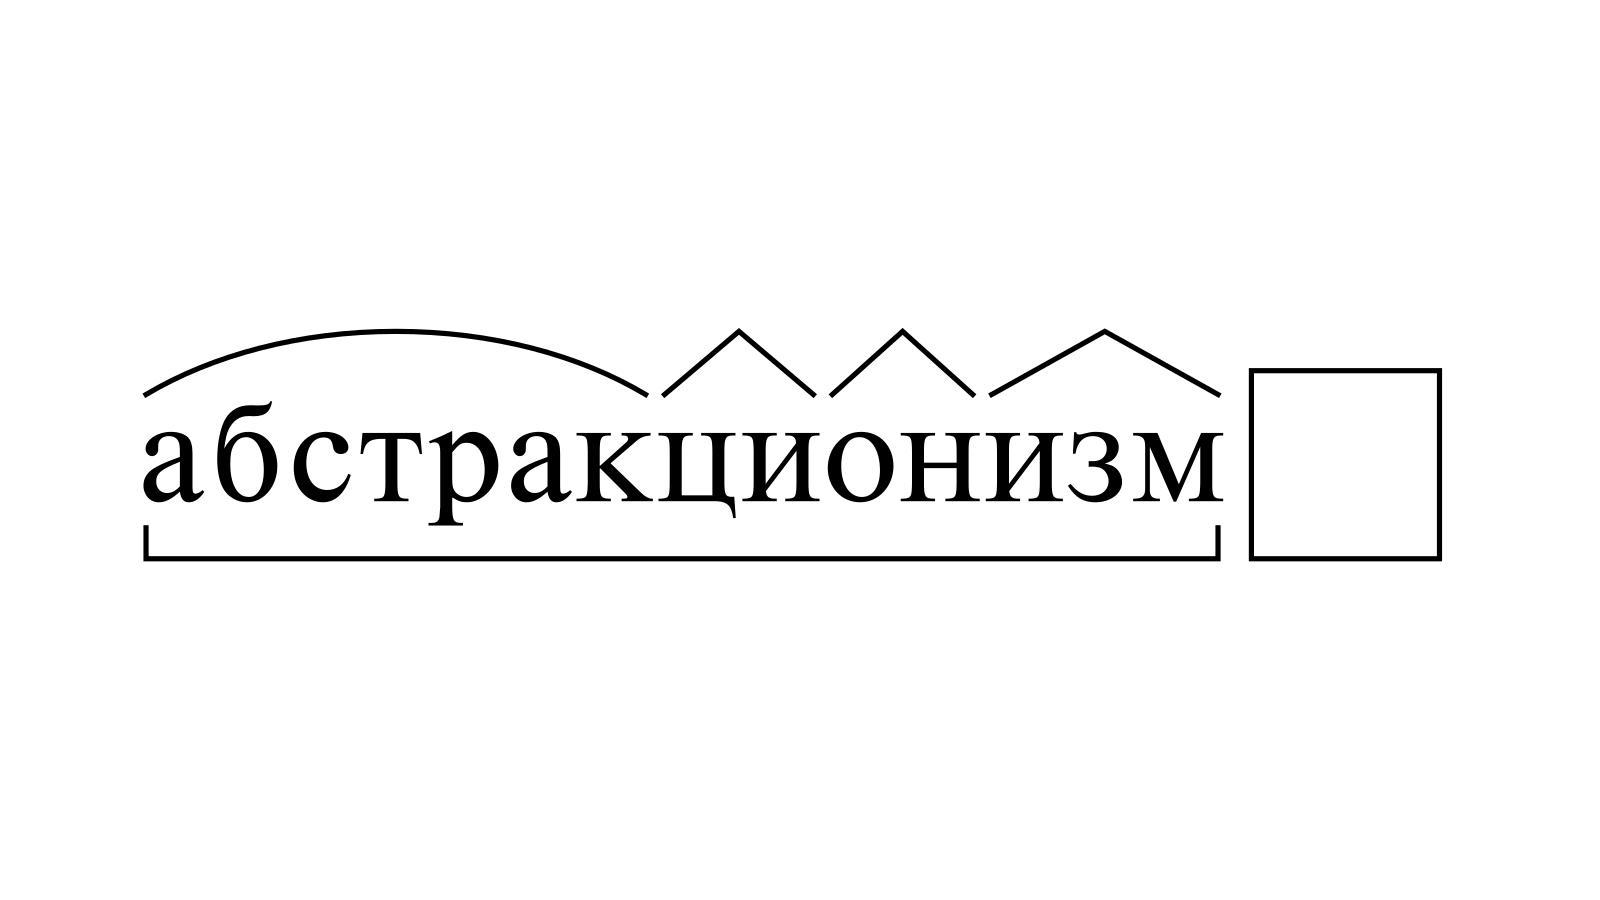 Разбор слова «абстракционизм» по составу